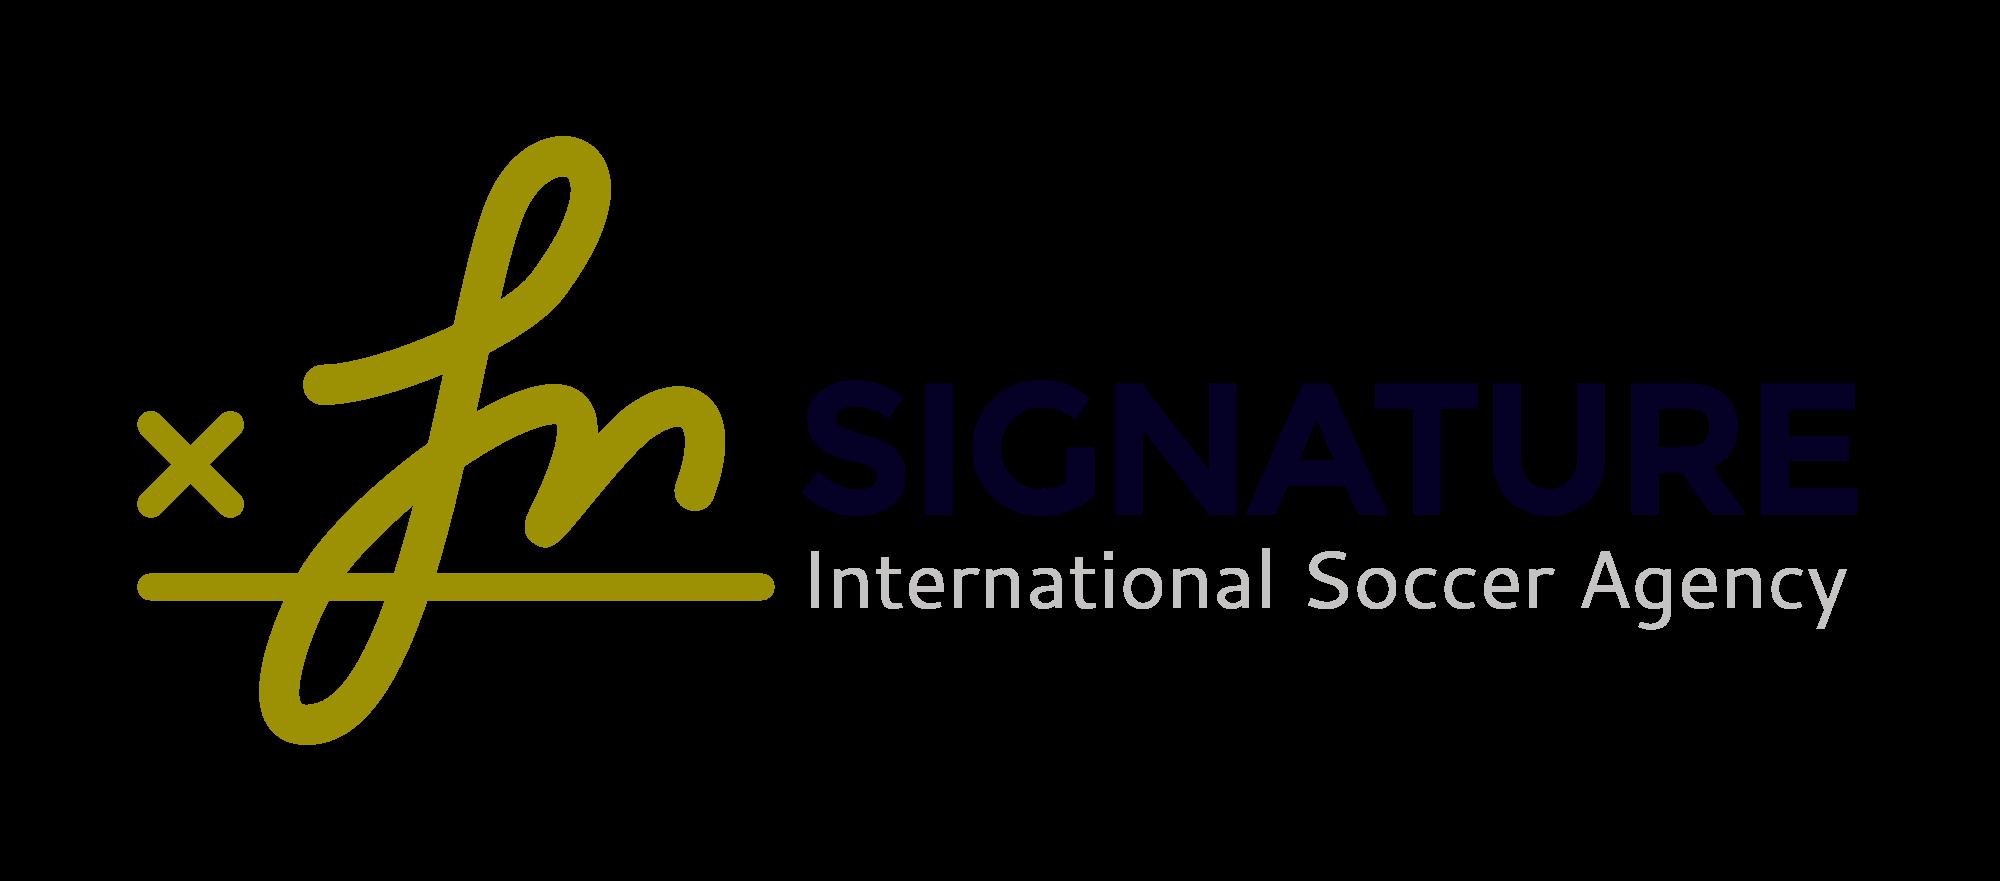 SIGNATURE-logo (1).png